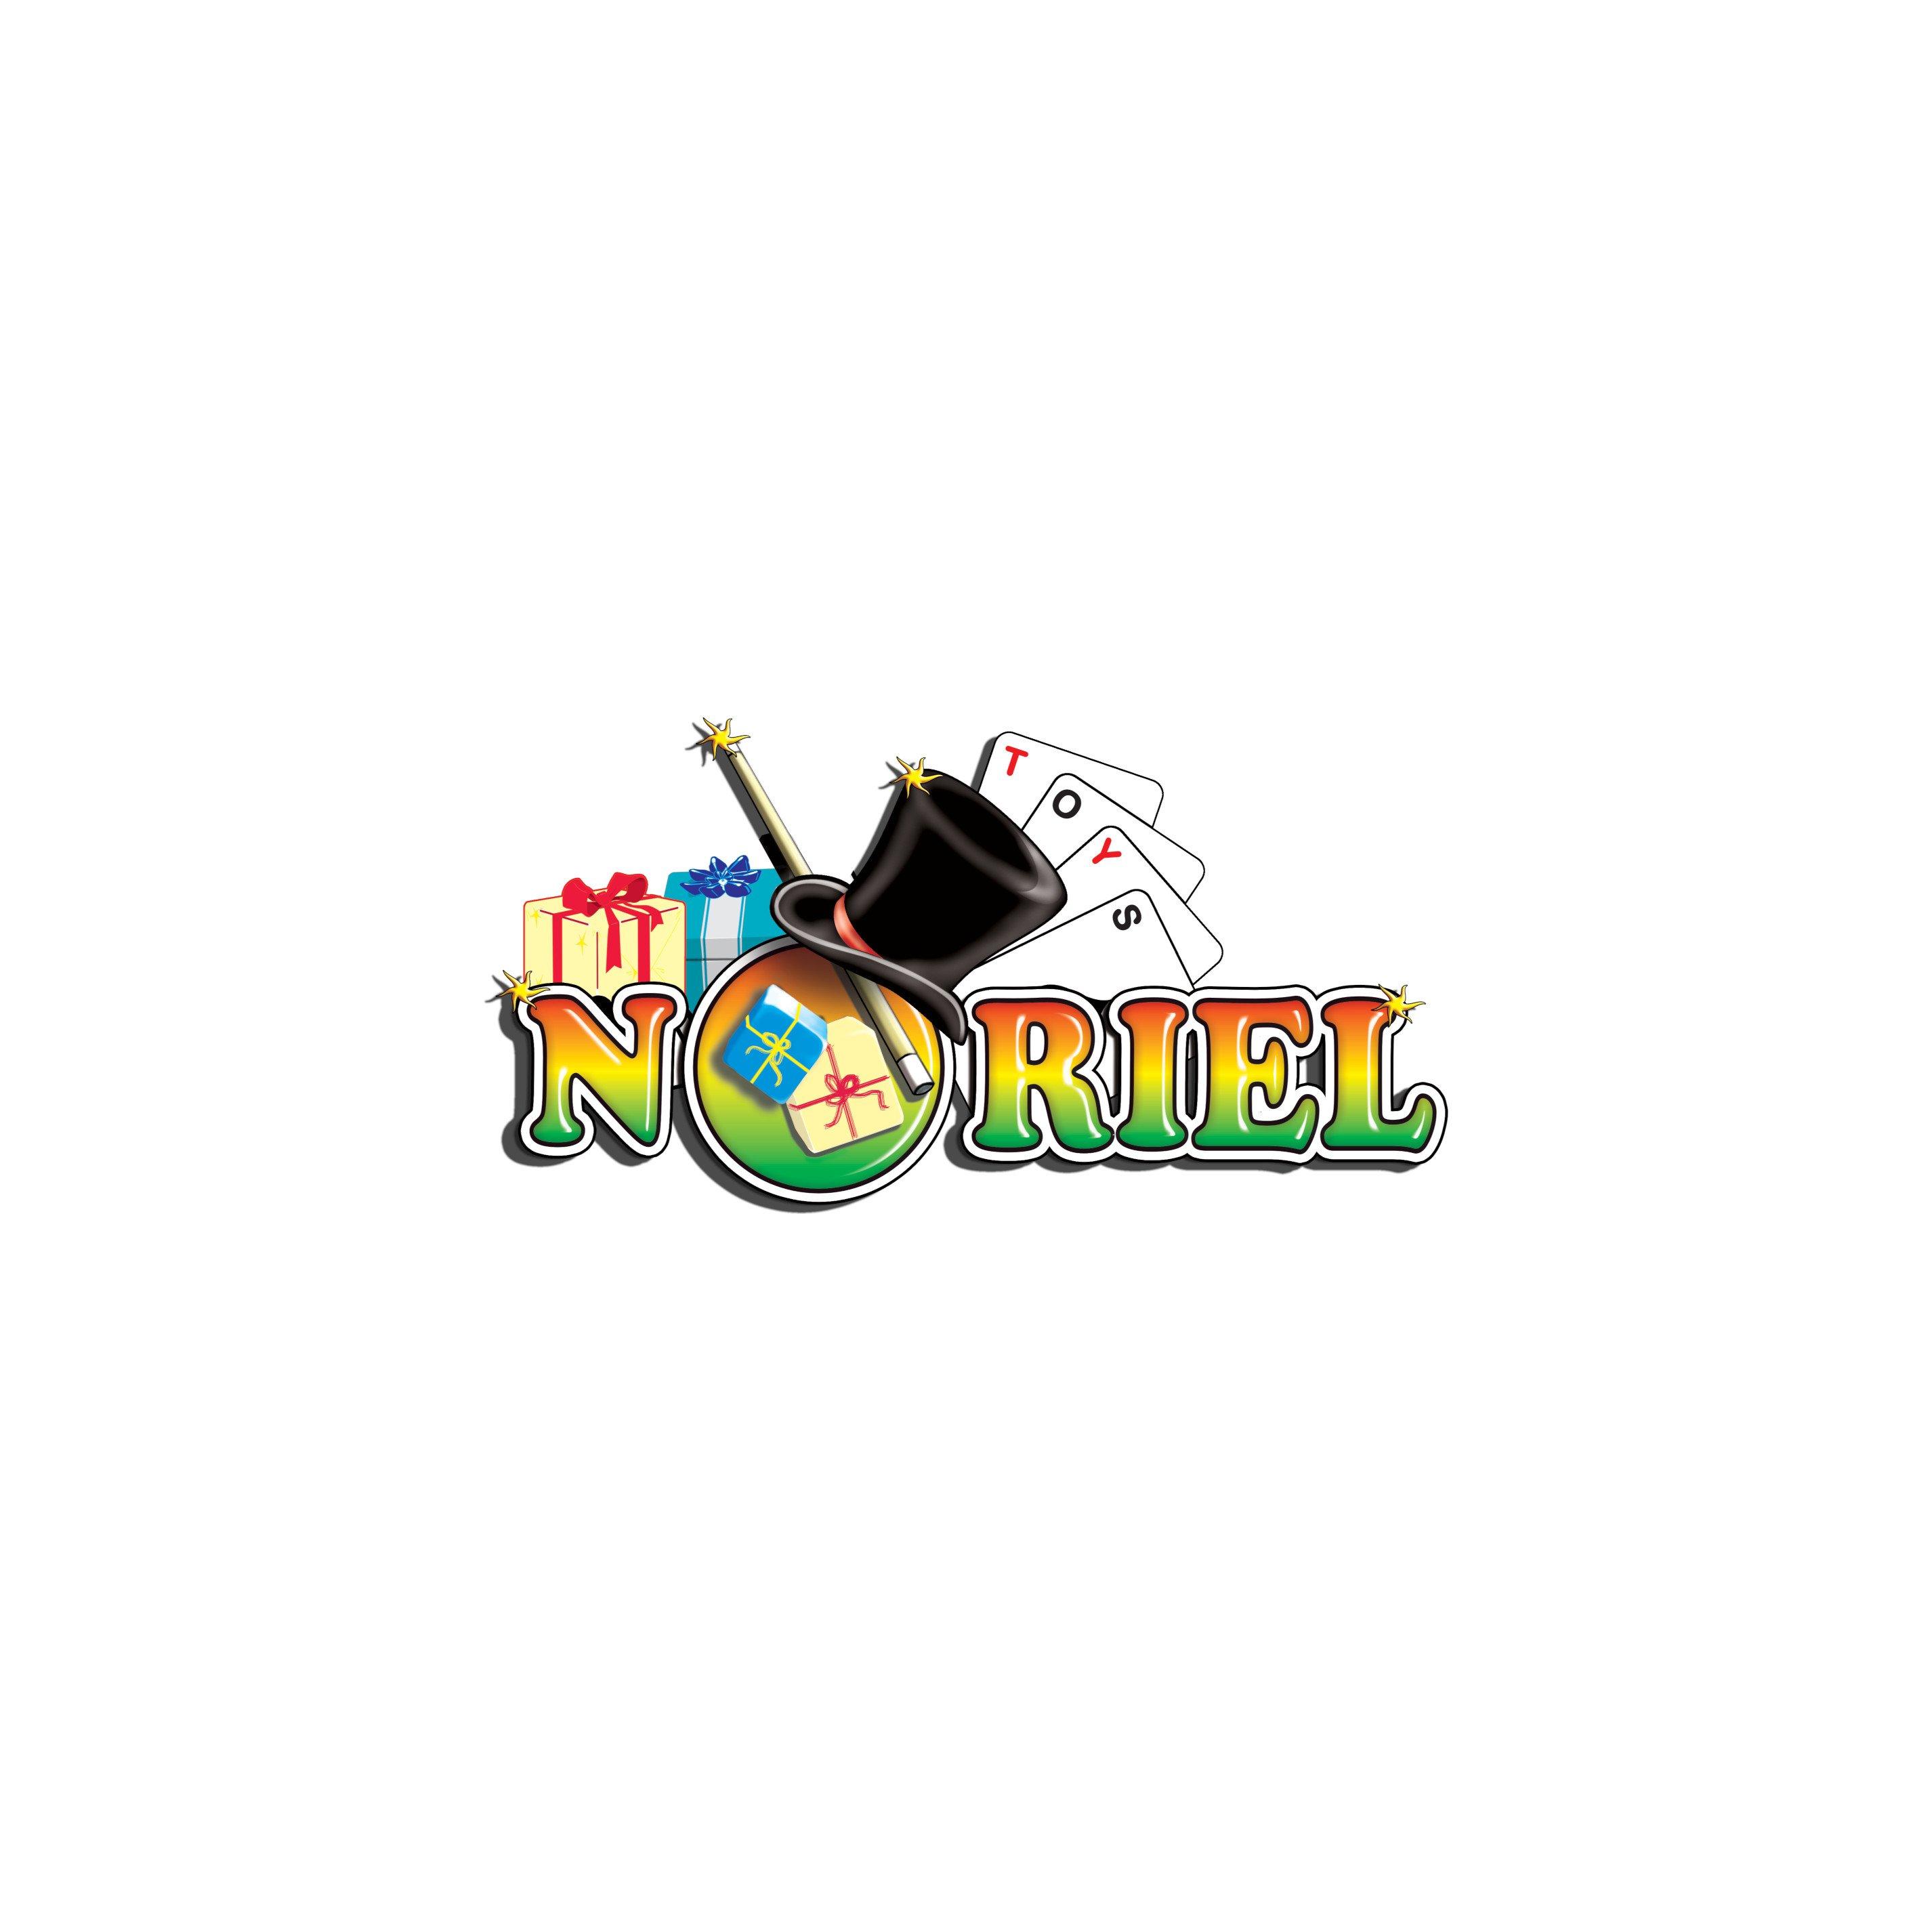 LG10769_001w LEGO® Juniors - Vacanta cu rulota Toy Story 4 (10769)